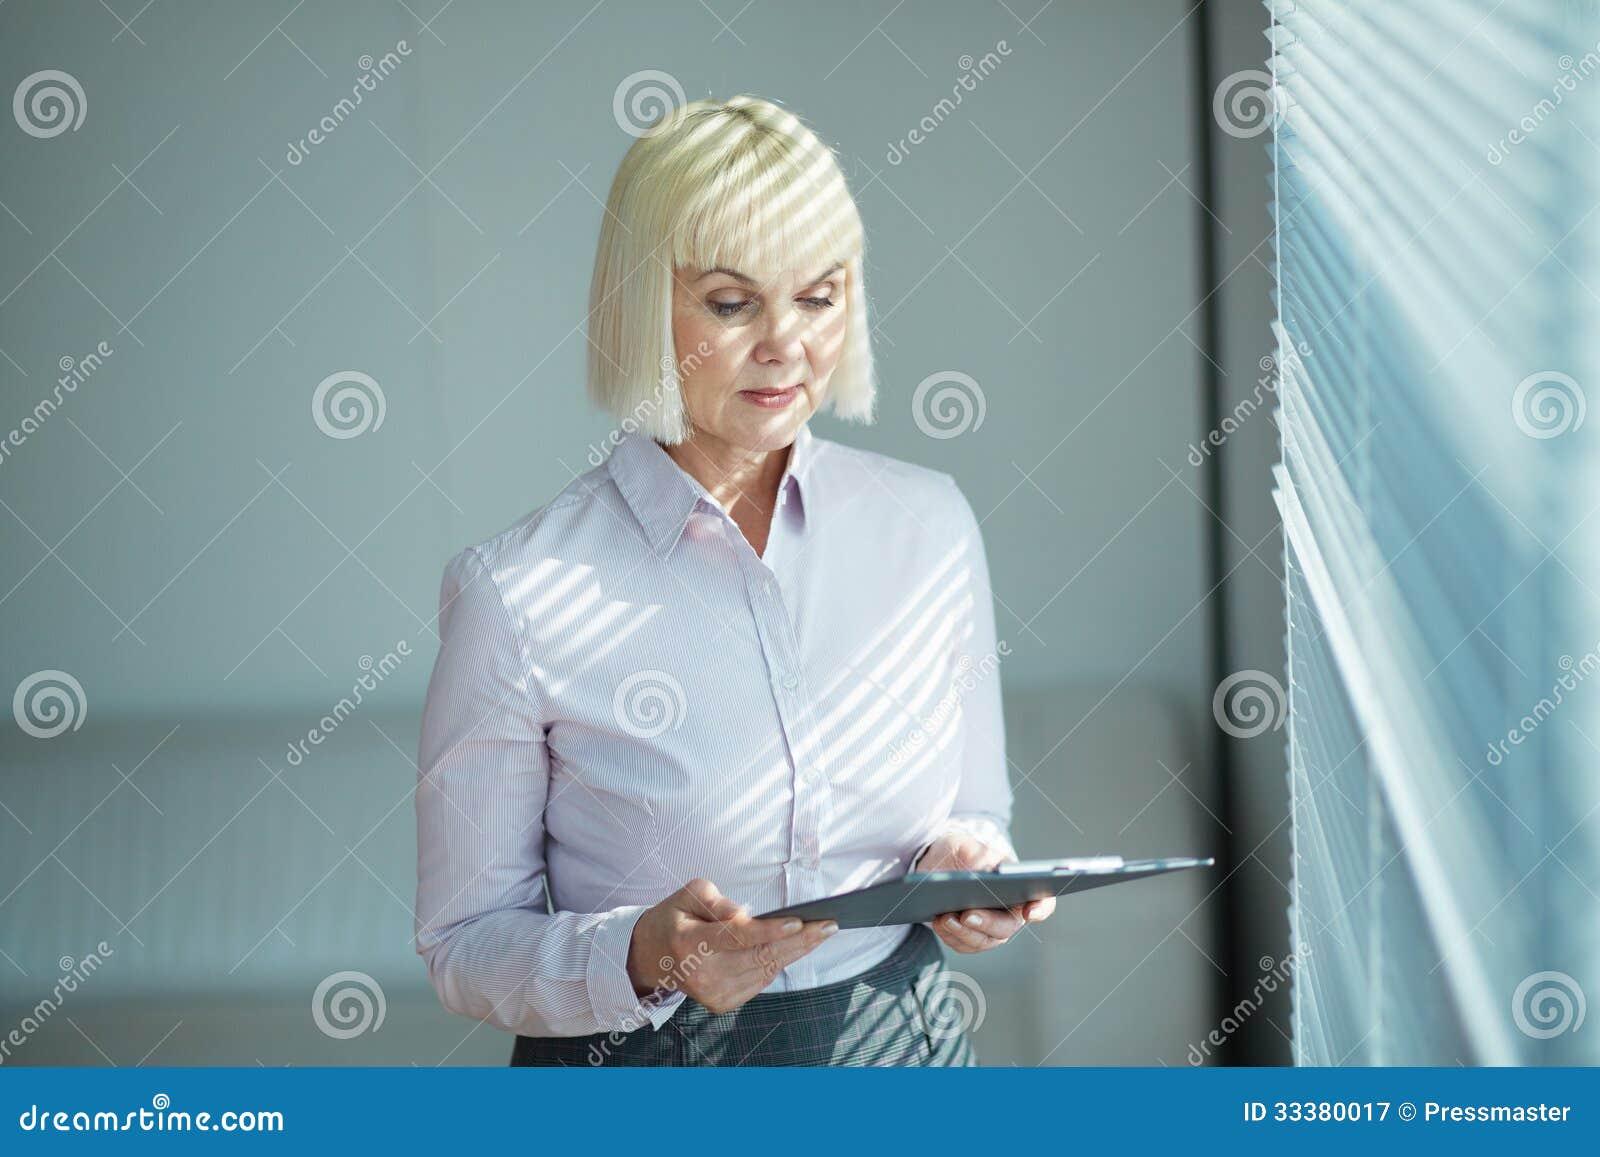 mature secretary stock image. image of formal, caucasian - 33380017